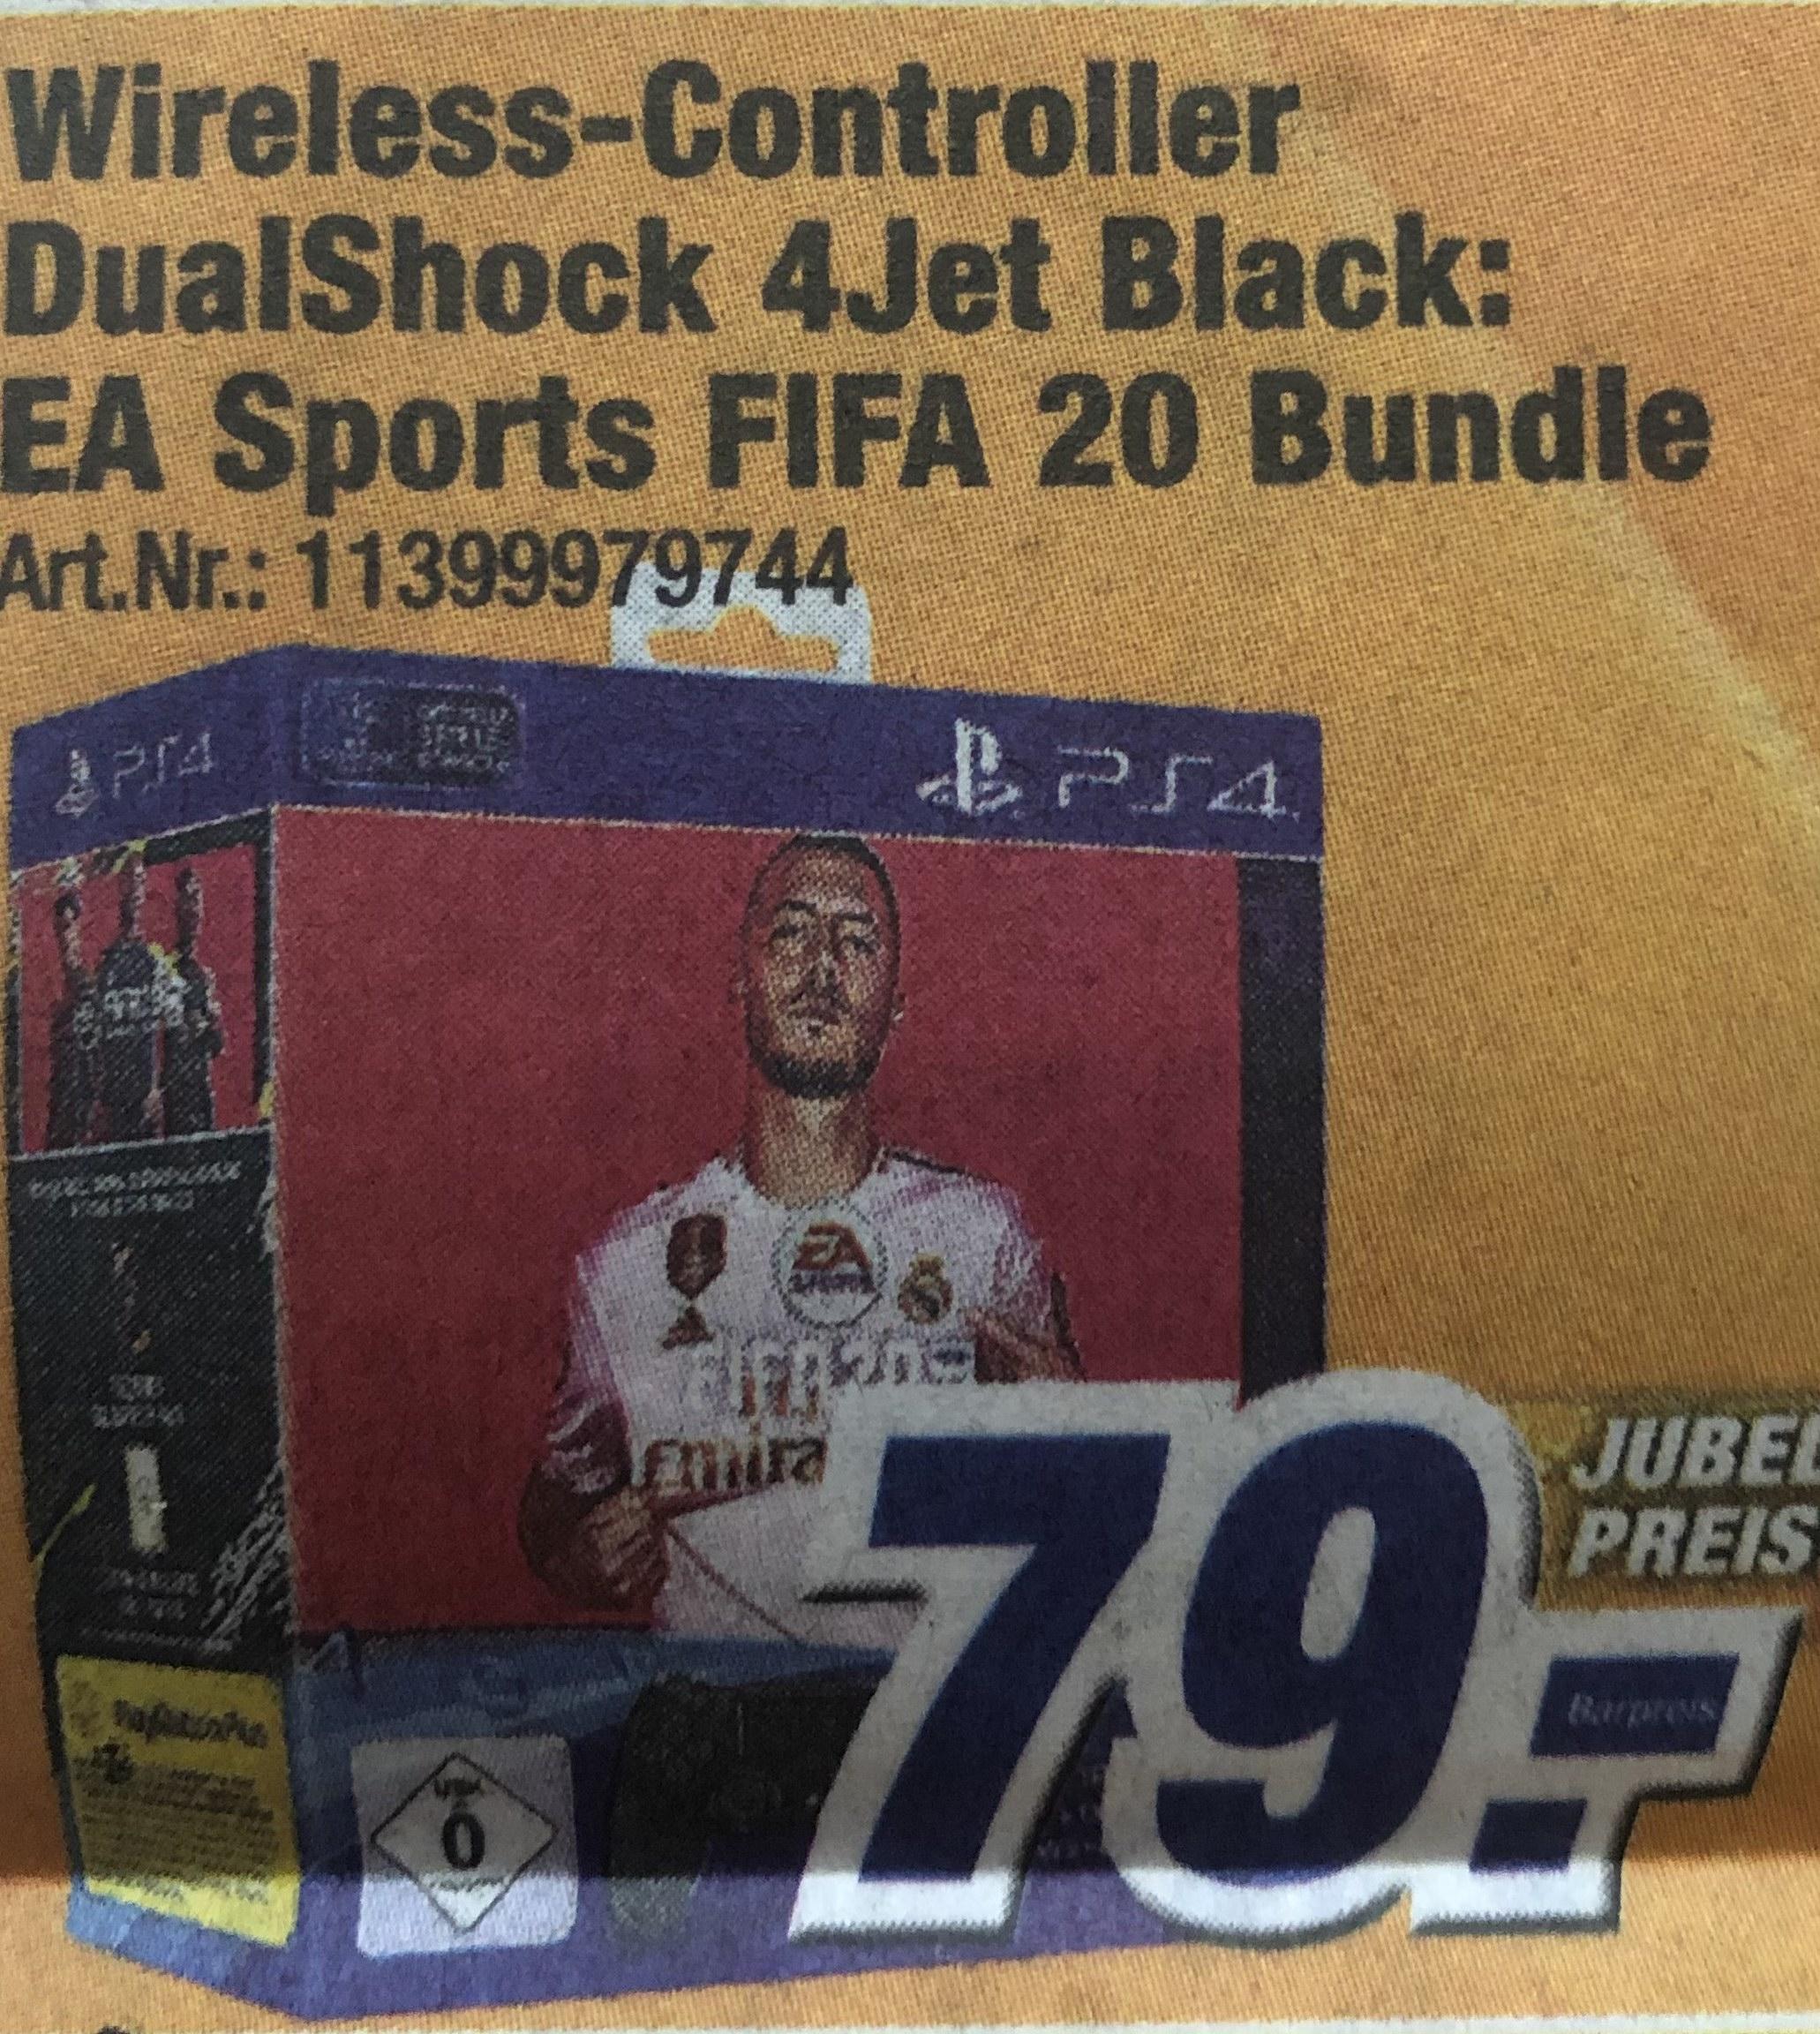 Regional München: PS4 FIFA 20 + DualShock 4 Controller